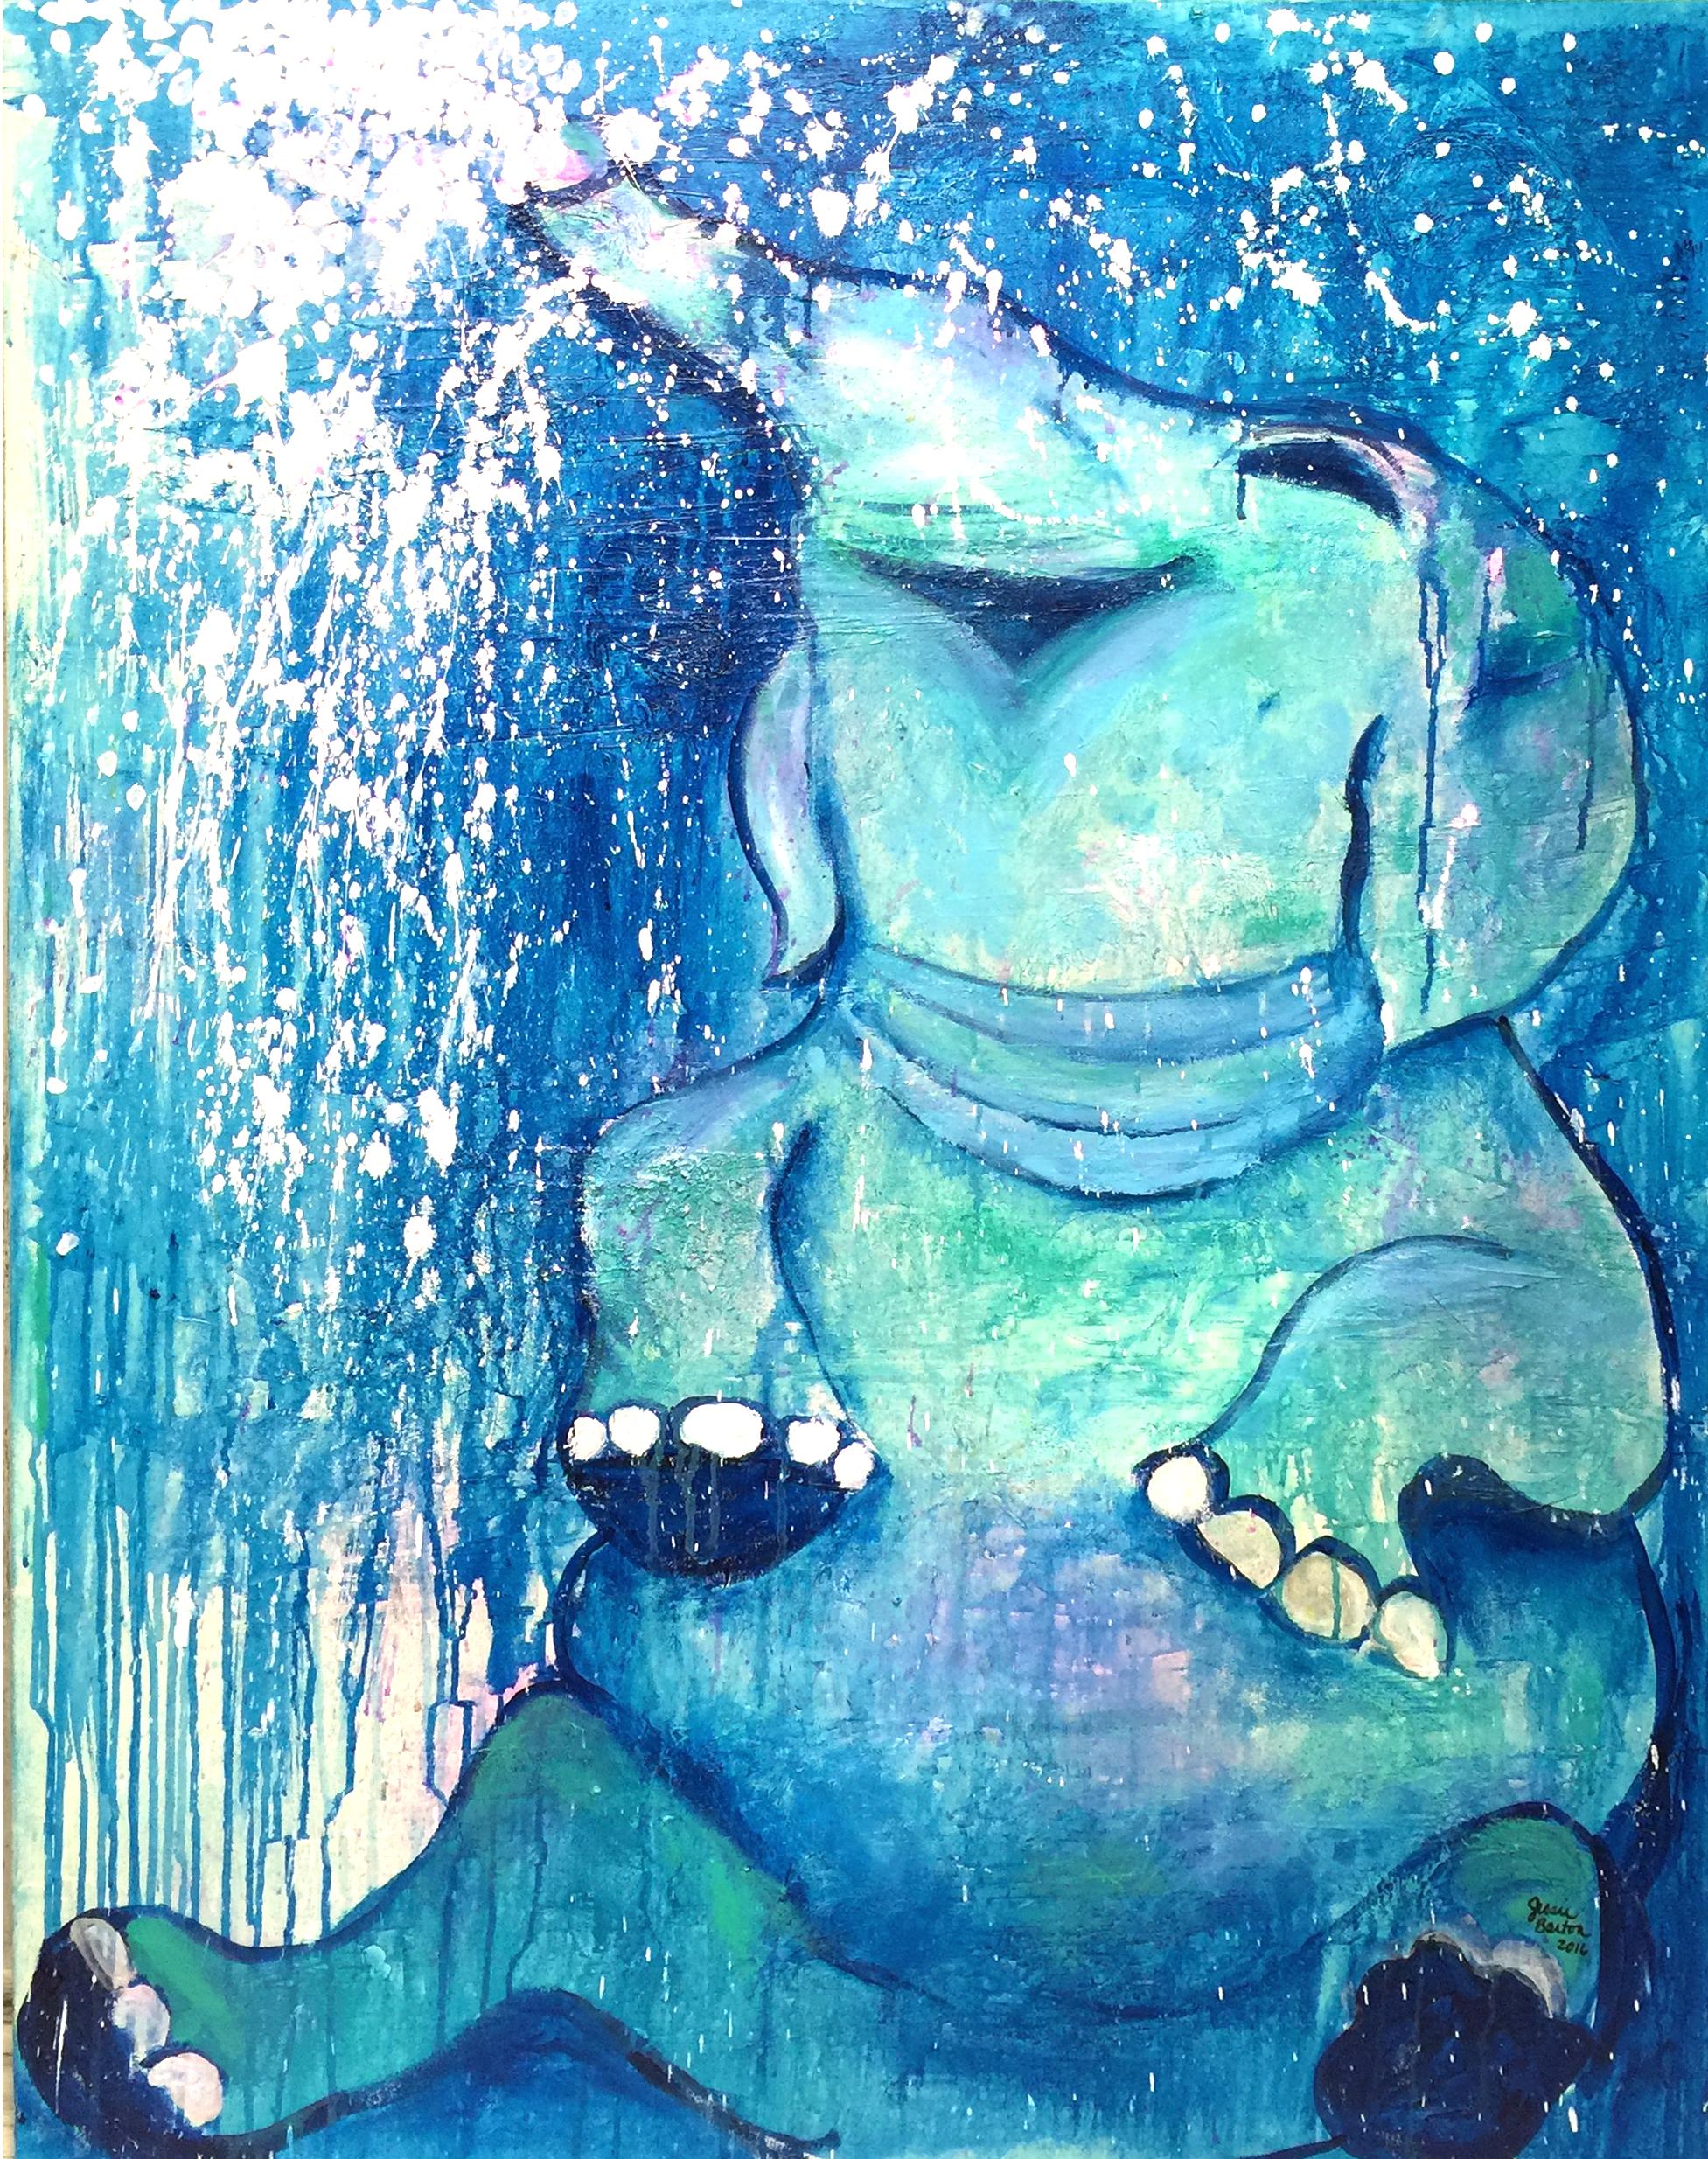 ELEPHANTWATER